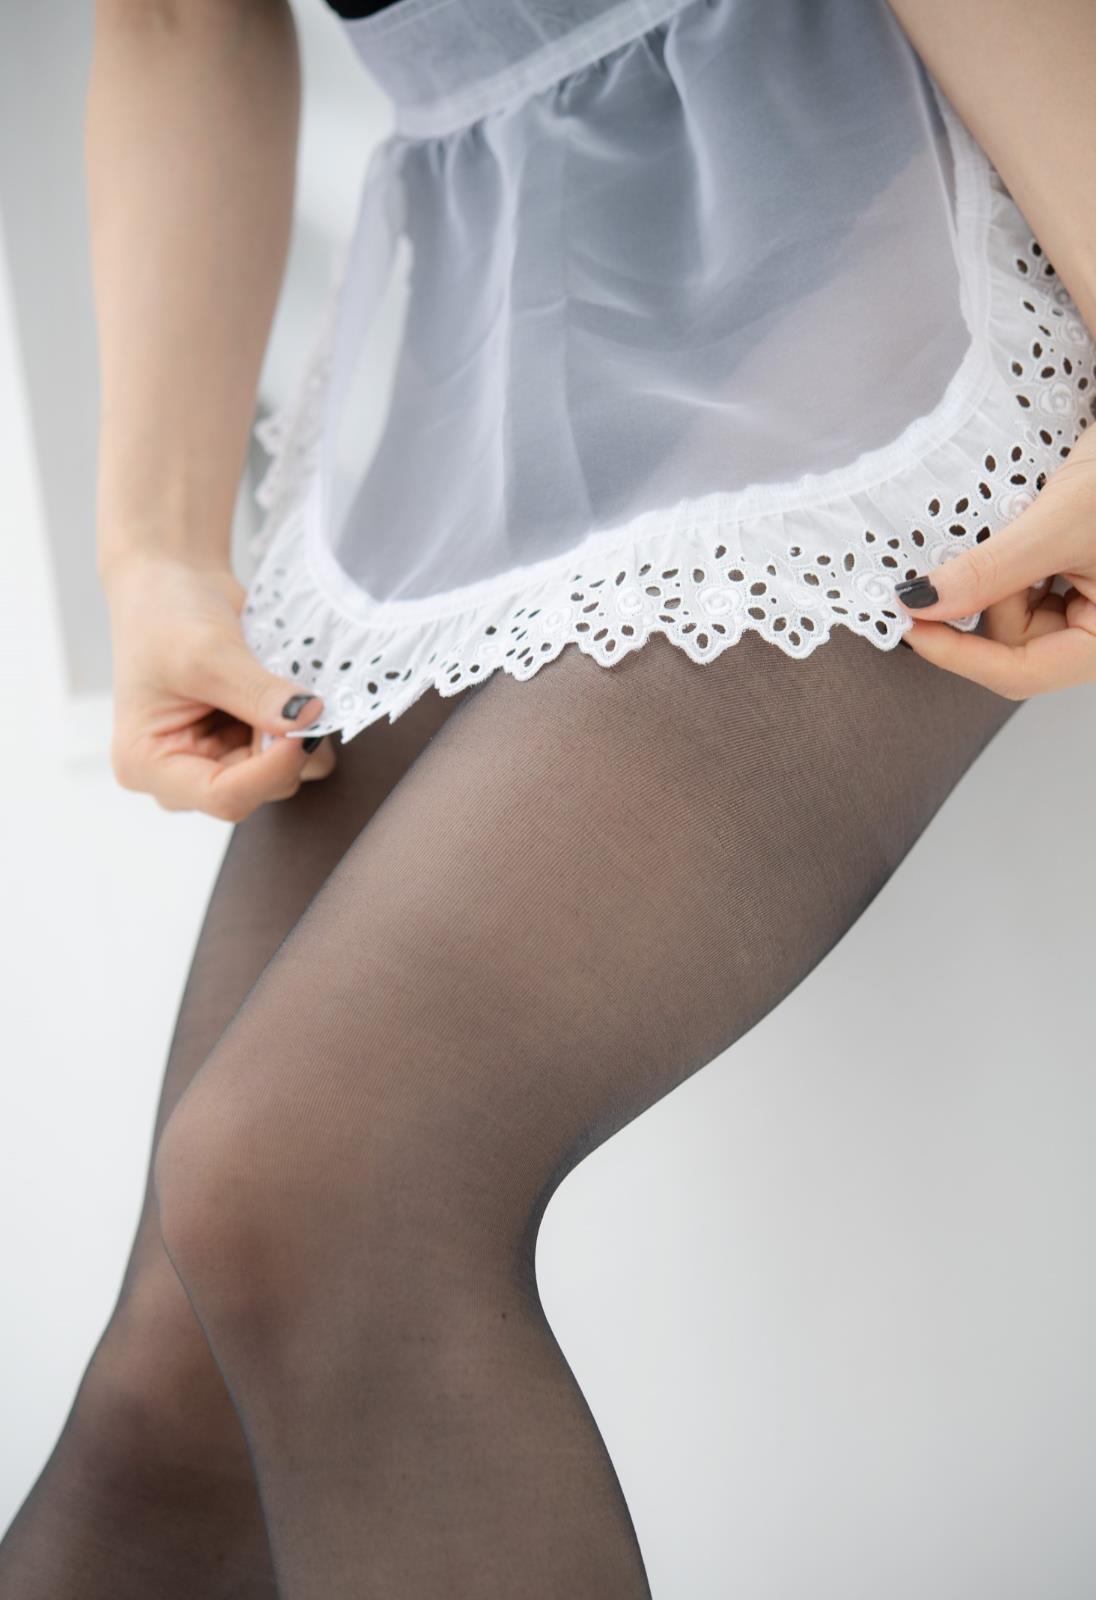 [CherryS(尊みを感じて桜井)] Bunnybunny-Maid